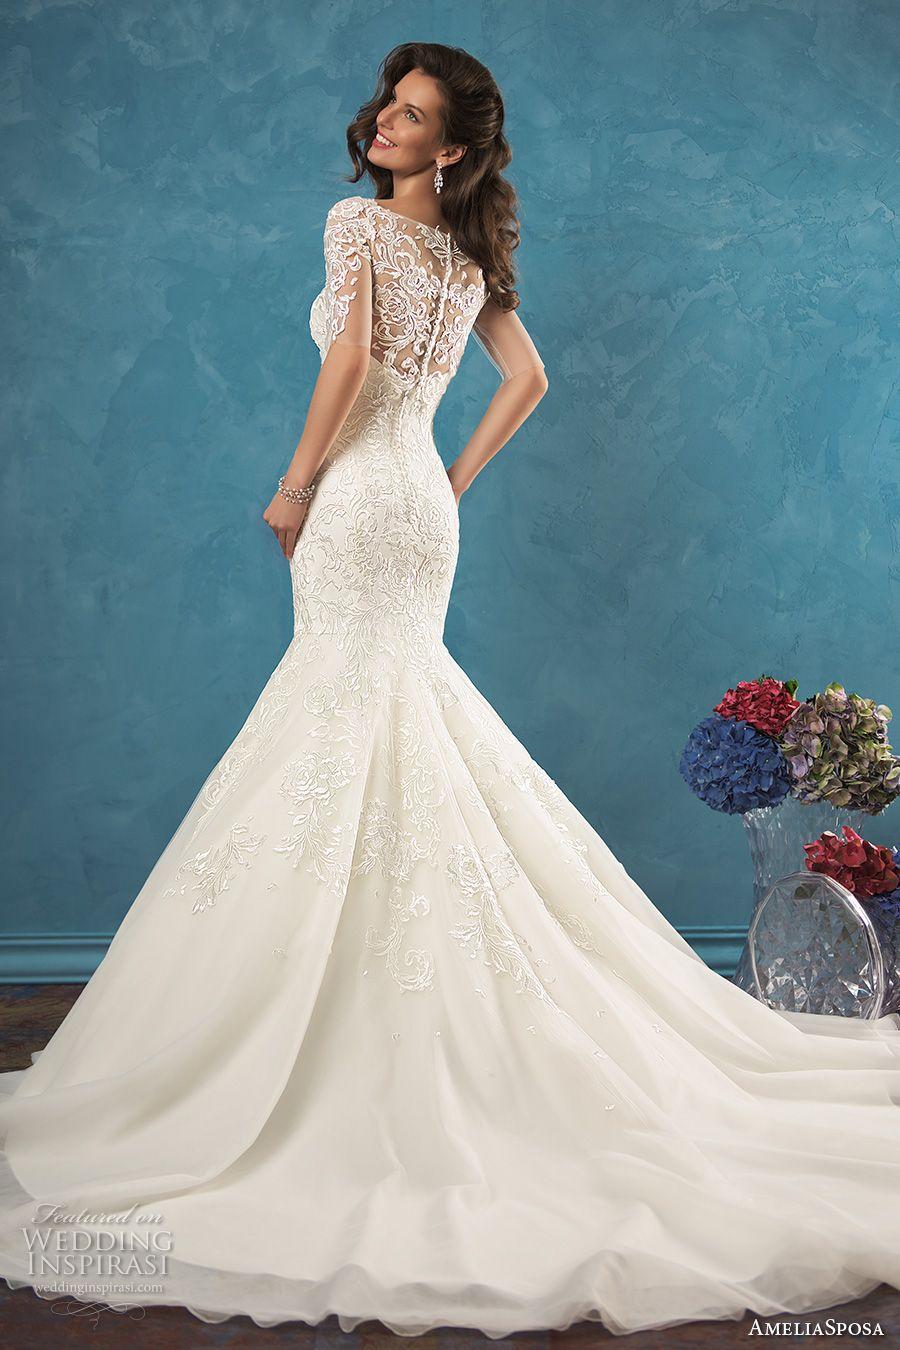 Amelia Sposa 2017 Wedding Dresses | Amelia sposa, Wedding dress and ...